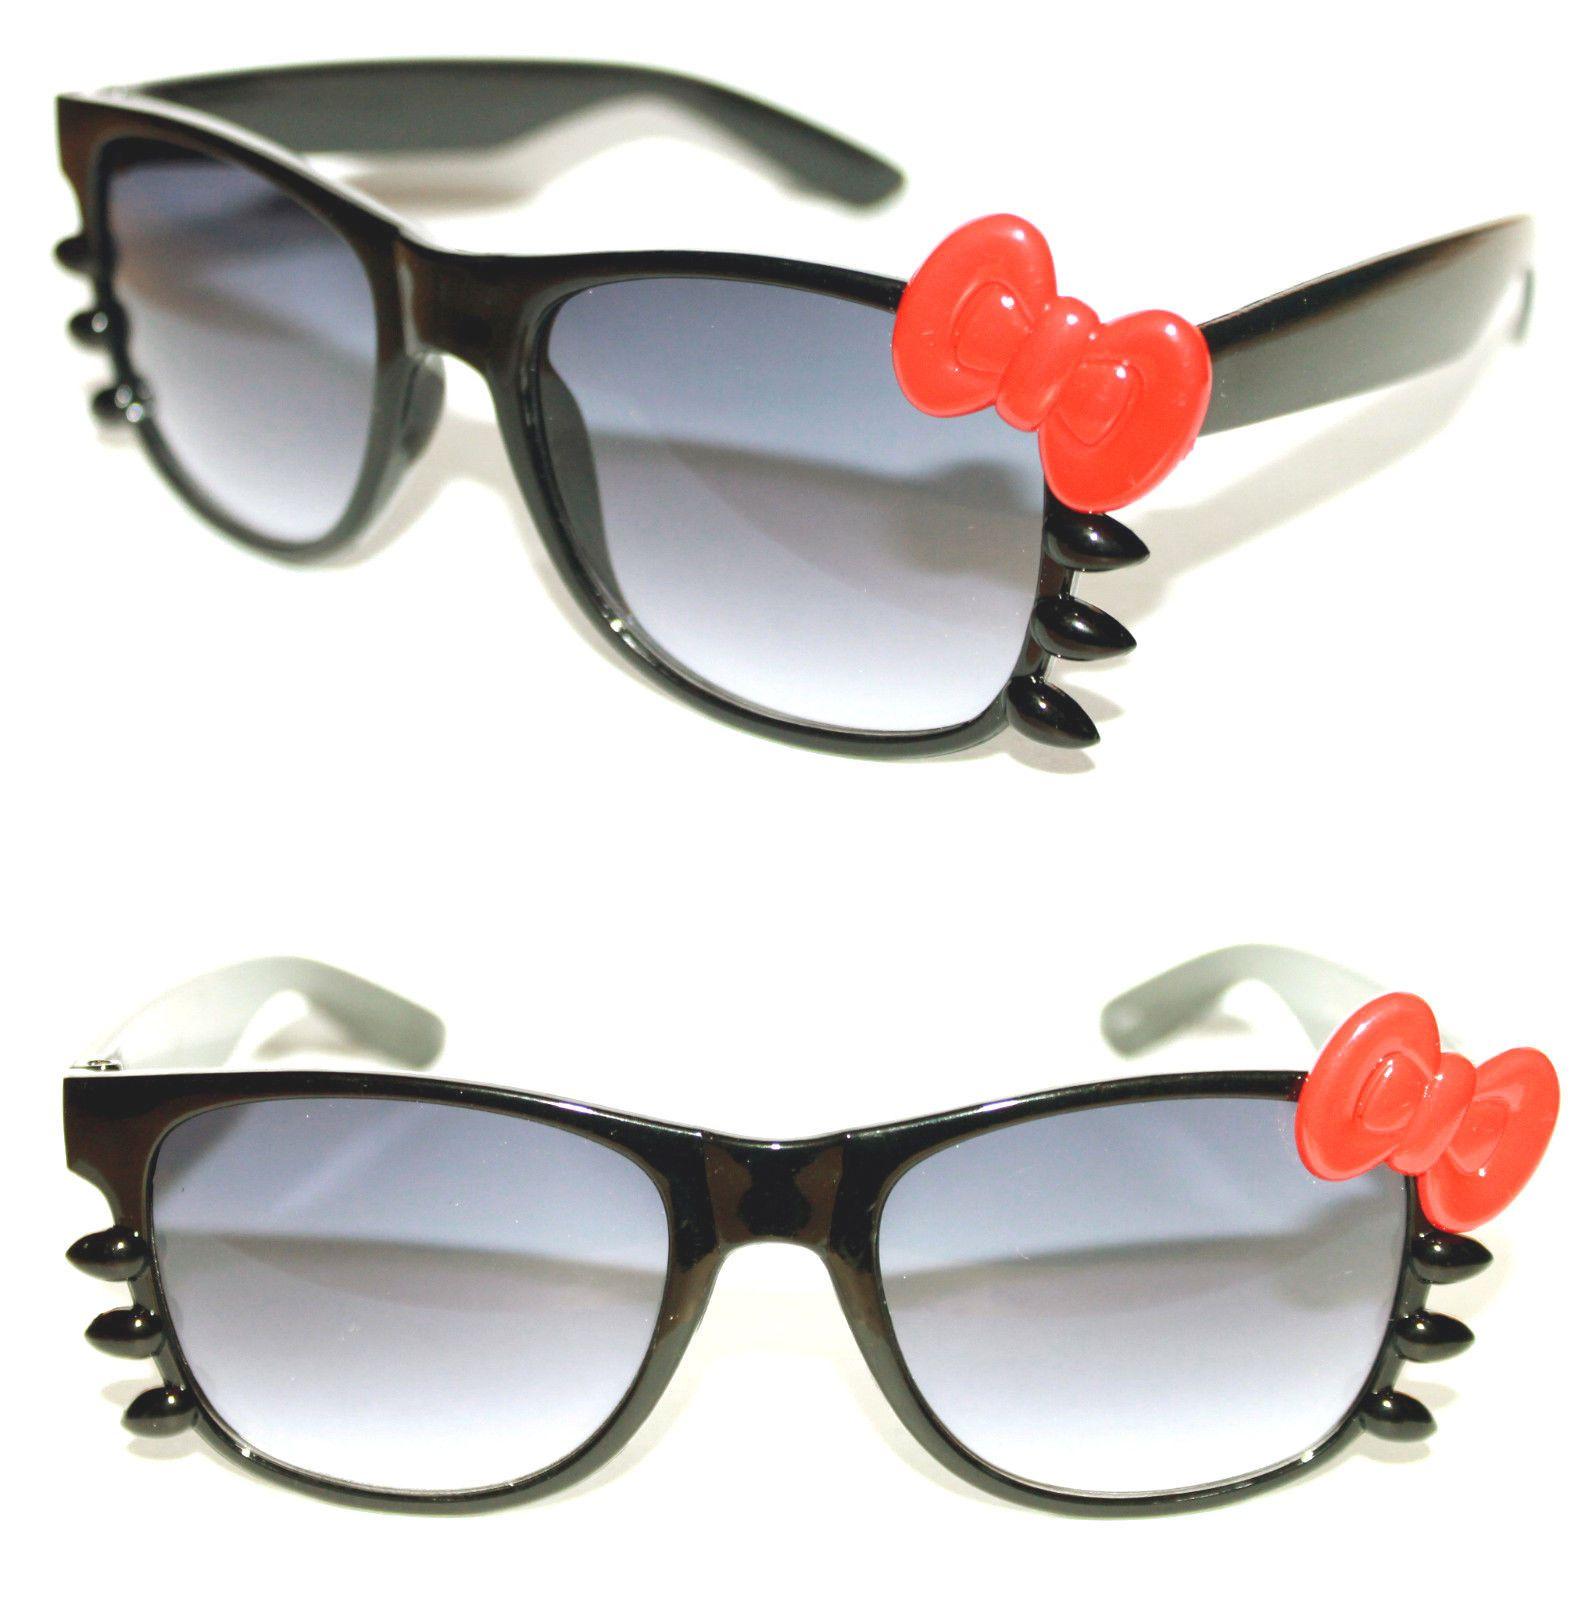 aebad9af54 Women s Hello Kitty Sunglasses Horn Rimmed Soho Black Frame Red Bow Whiskers